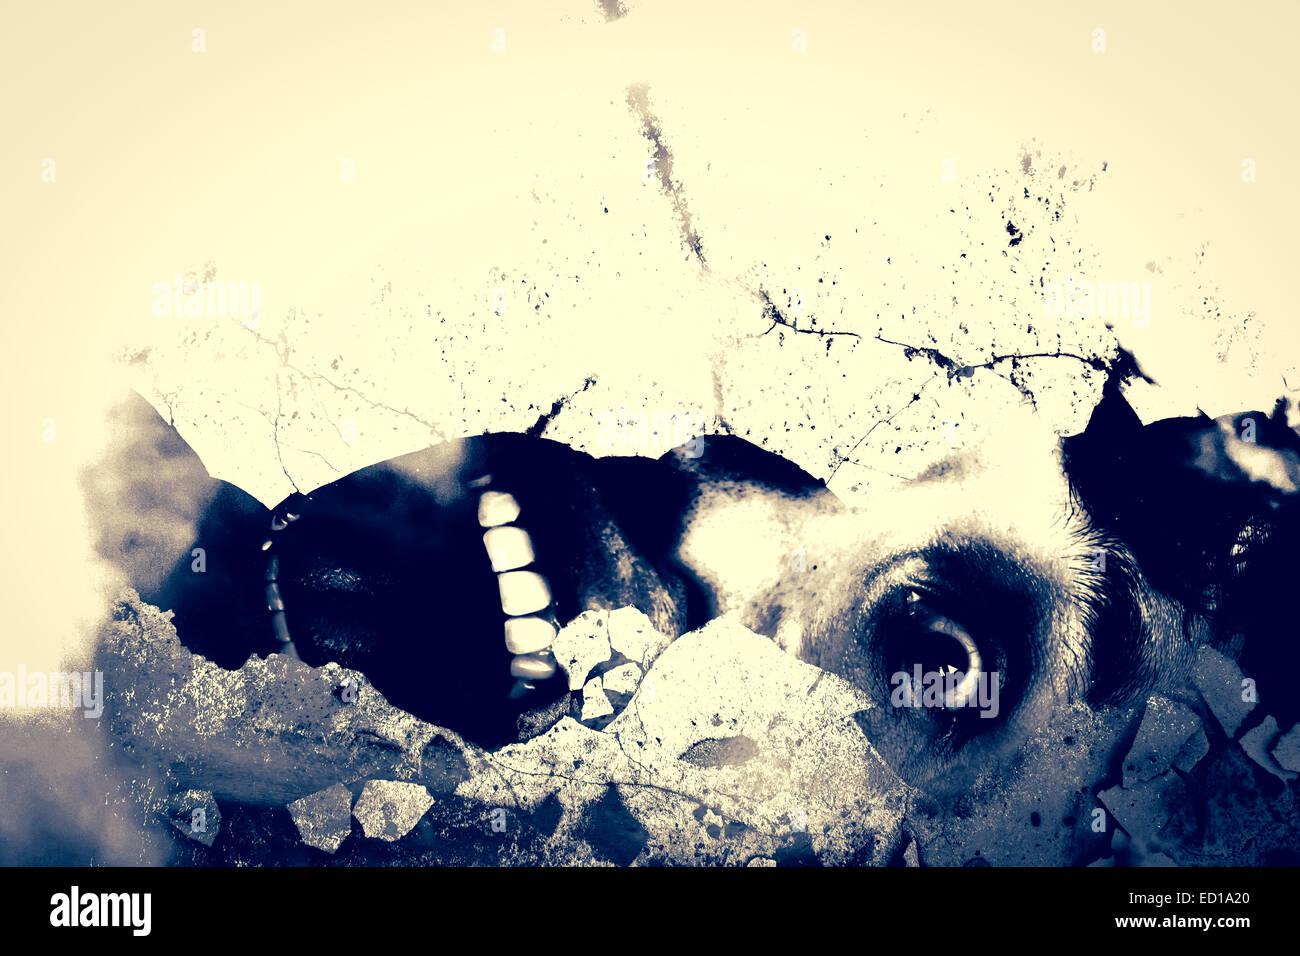 Ghost Homme Crier Sur Shattered Grunge Serie Mur Arriere